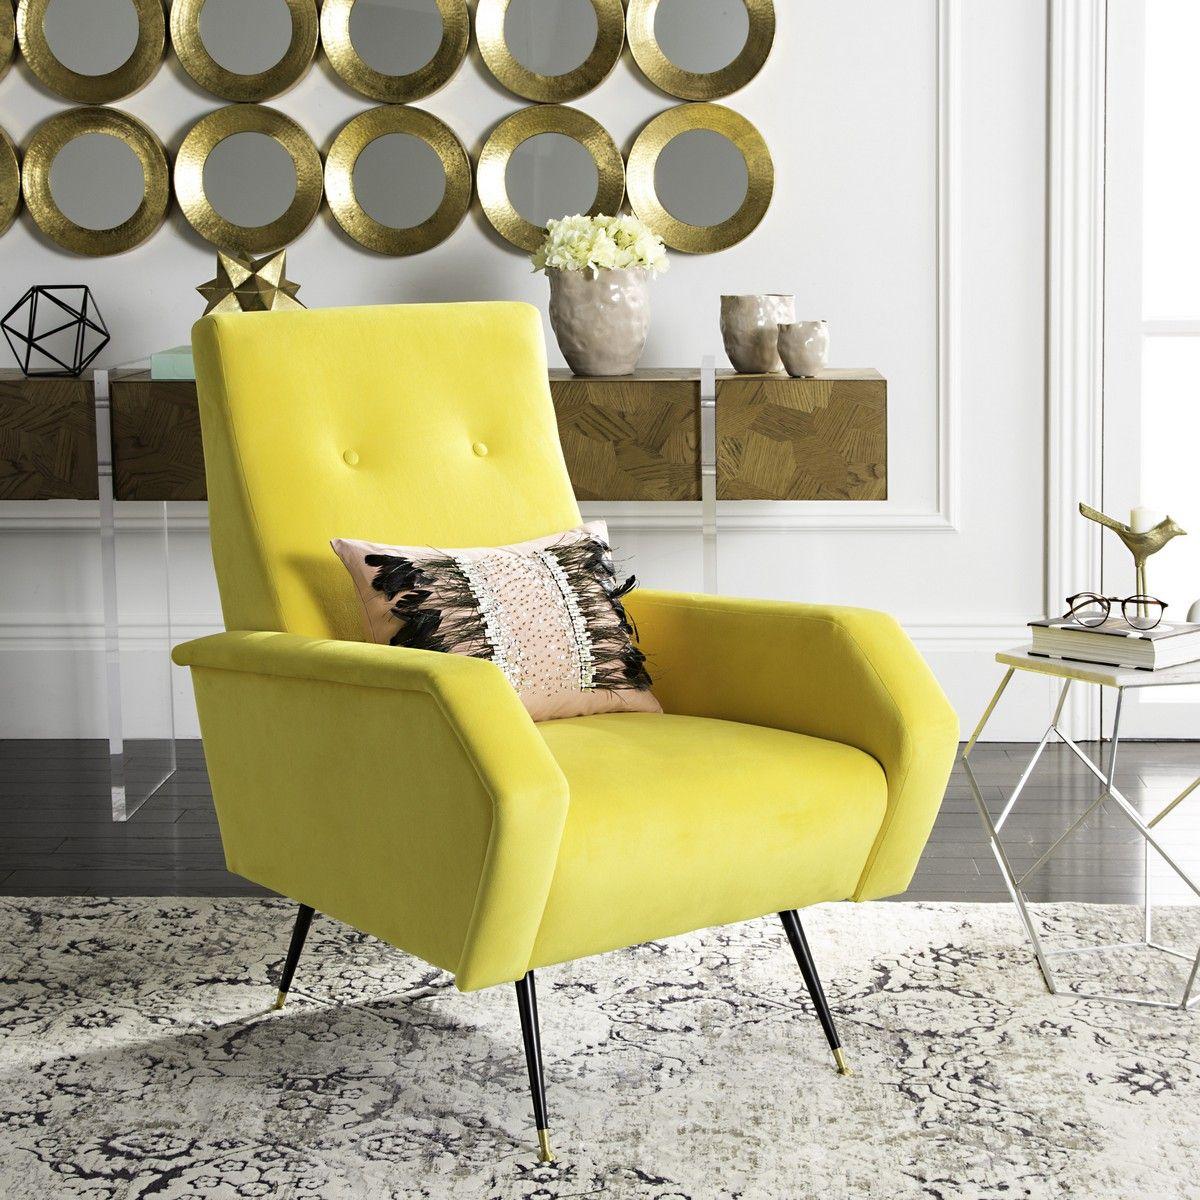 FOX6258A Accent Chairs Furniture by FOX6258A